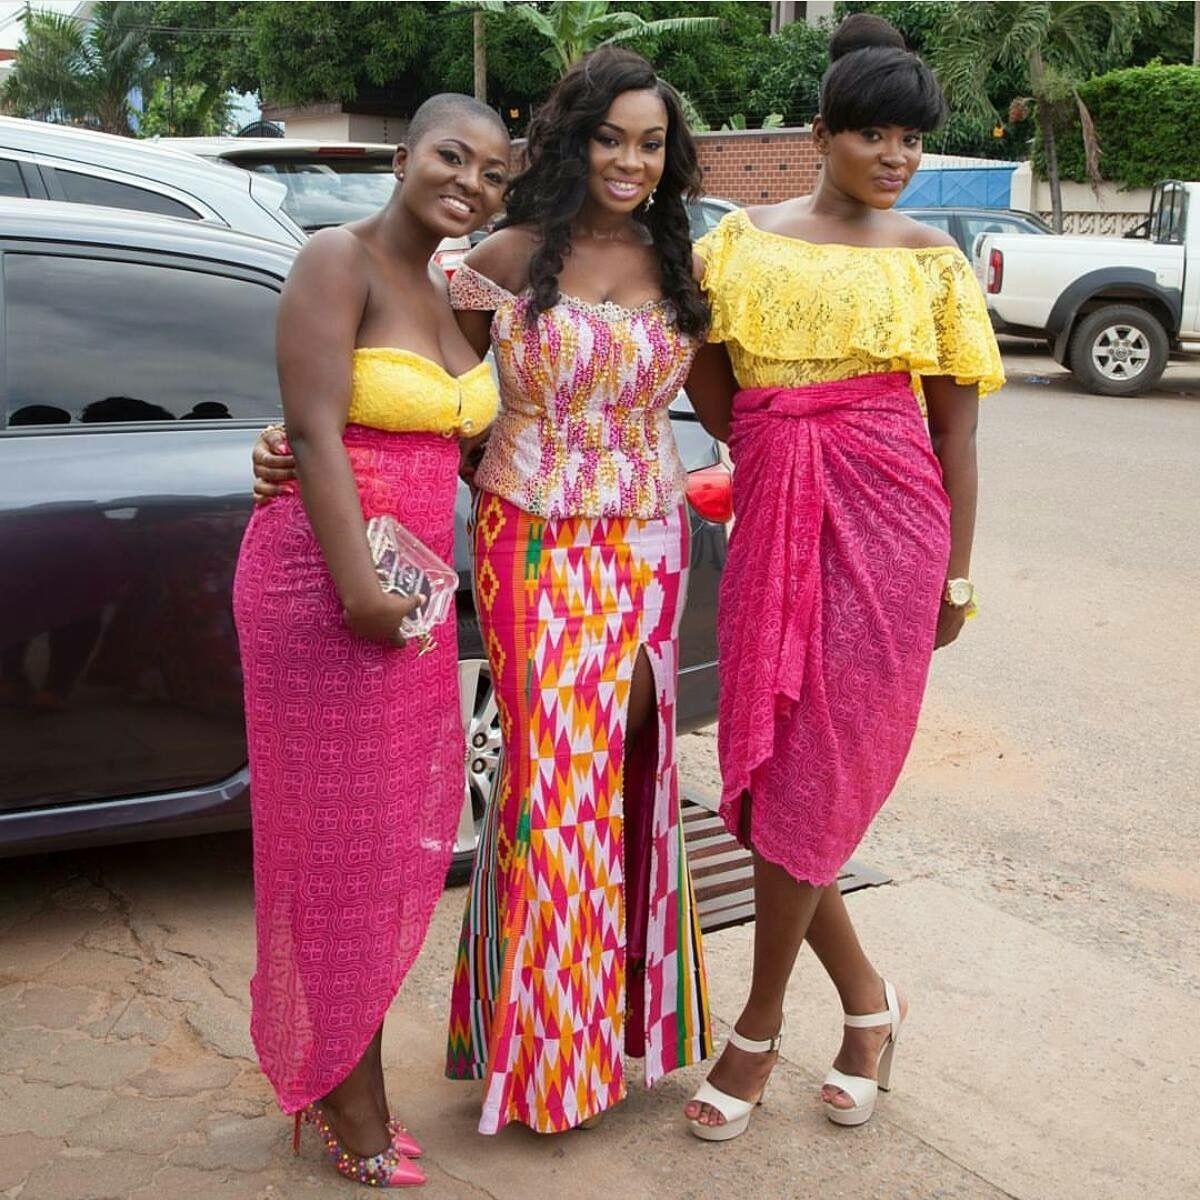 Pin de Immanuela en African Fashion | Pinterest | Africanos